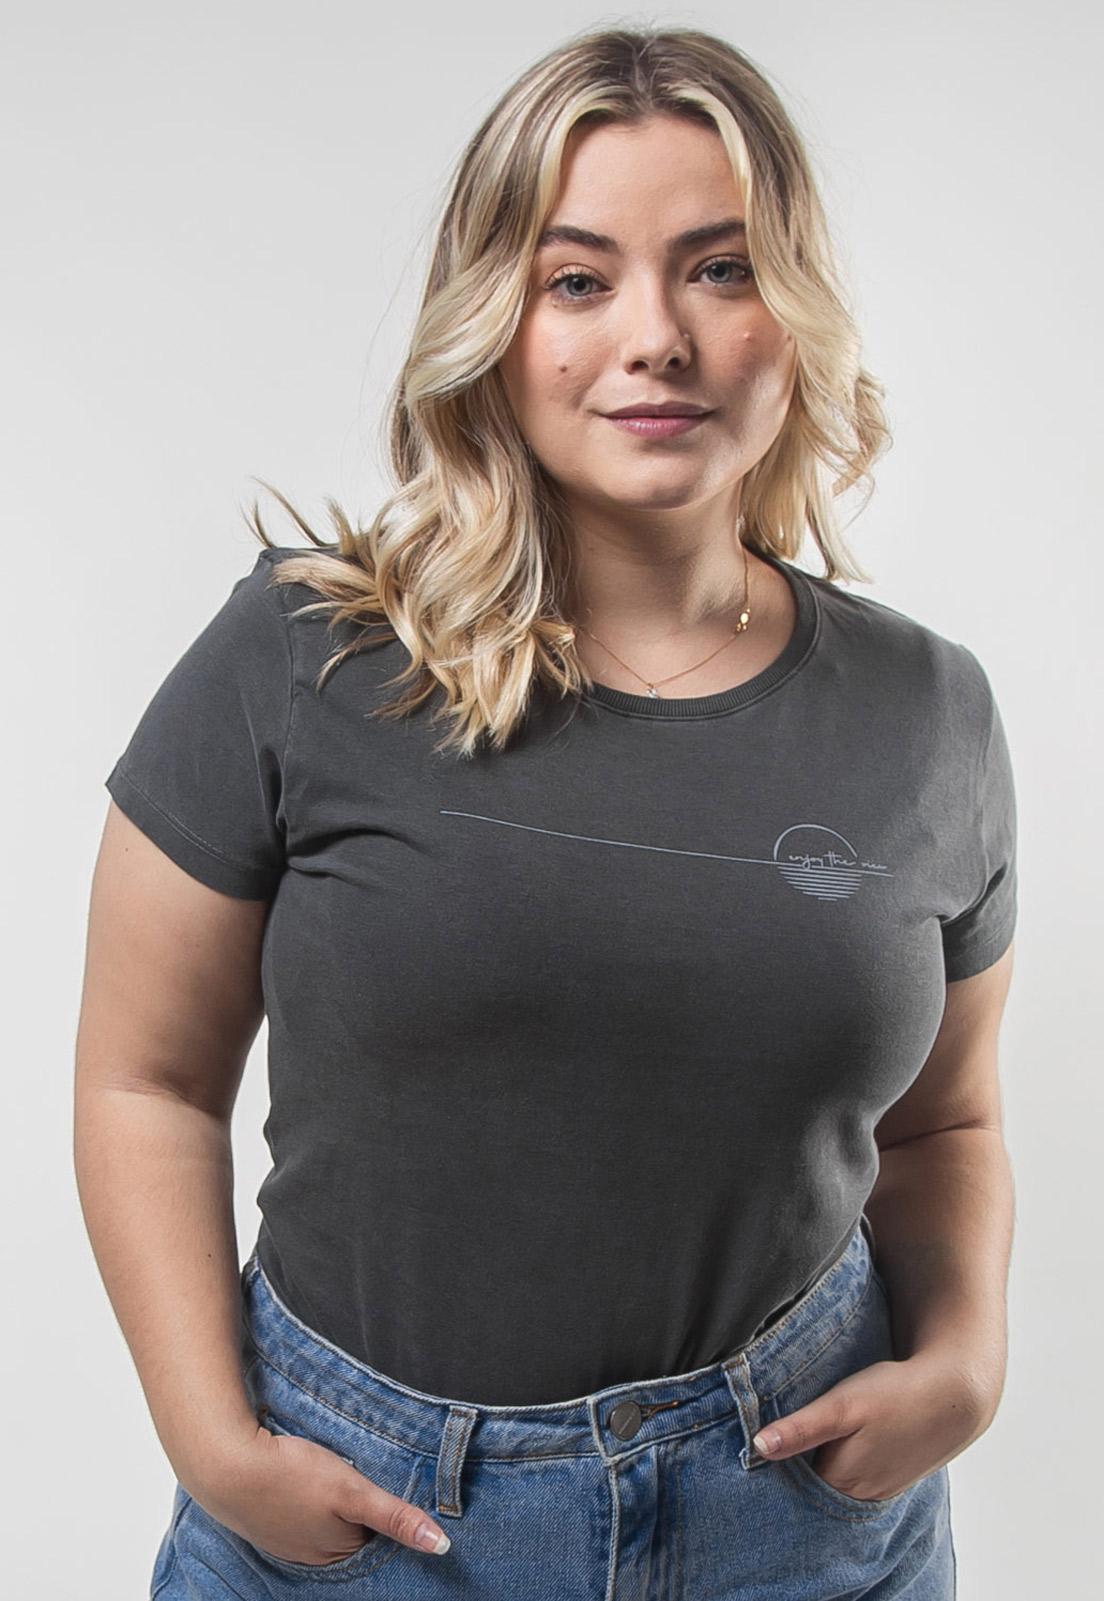 Camiseta Feminina Chumbo Estonada de Algodão Enjoy The View